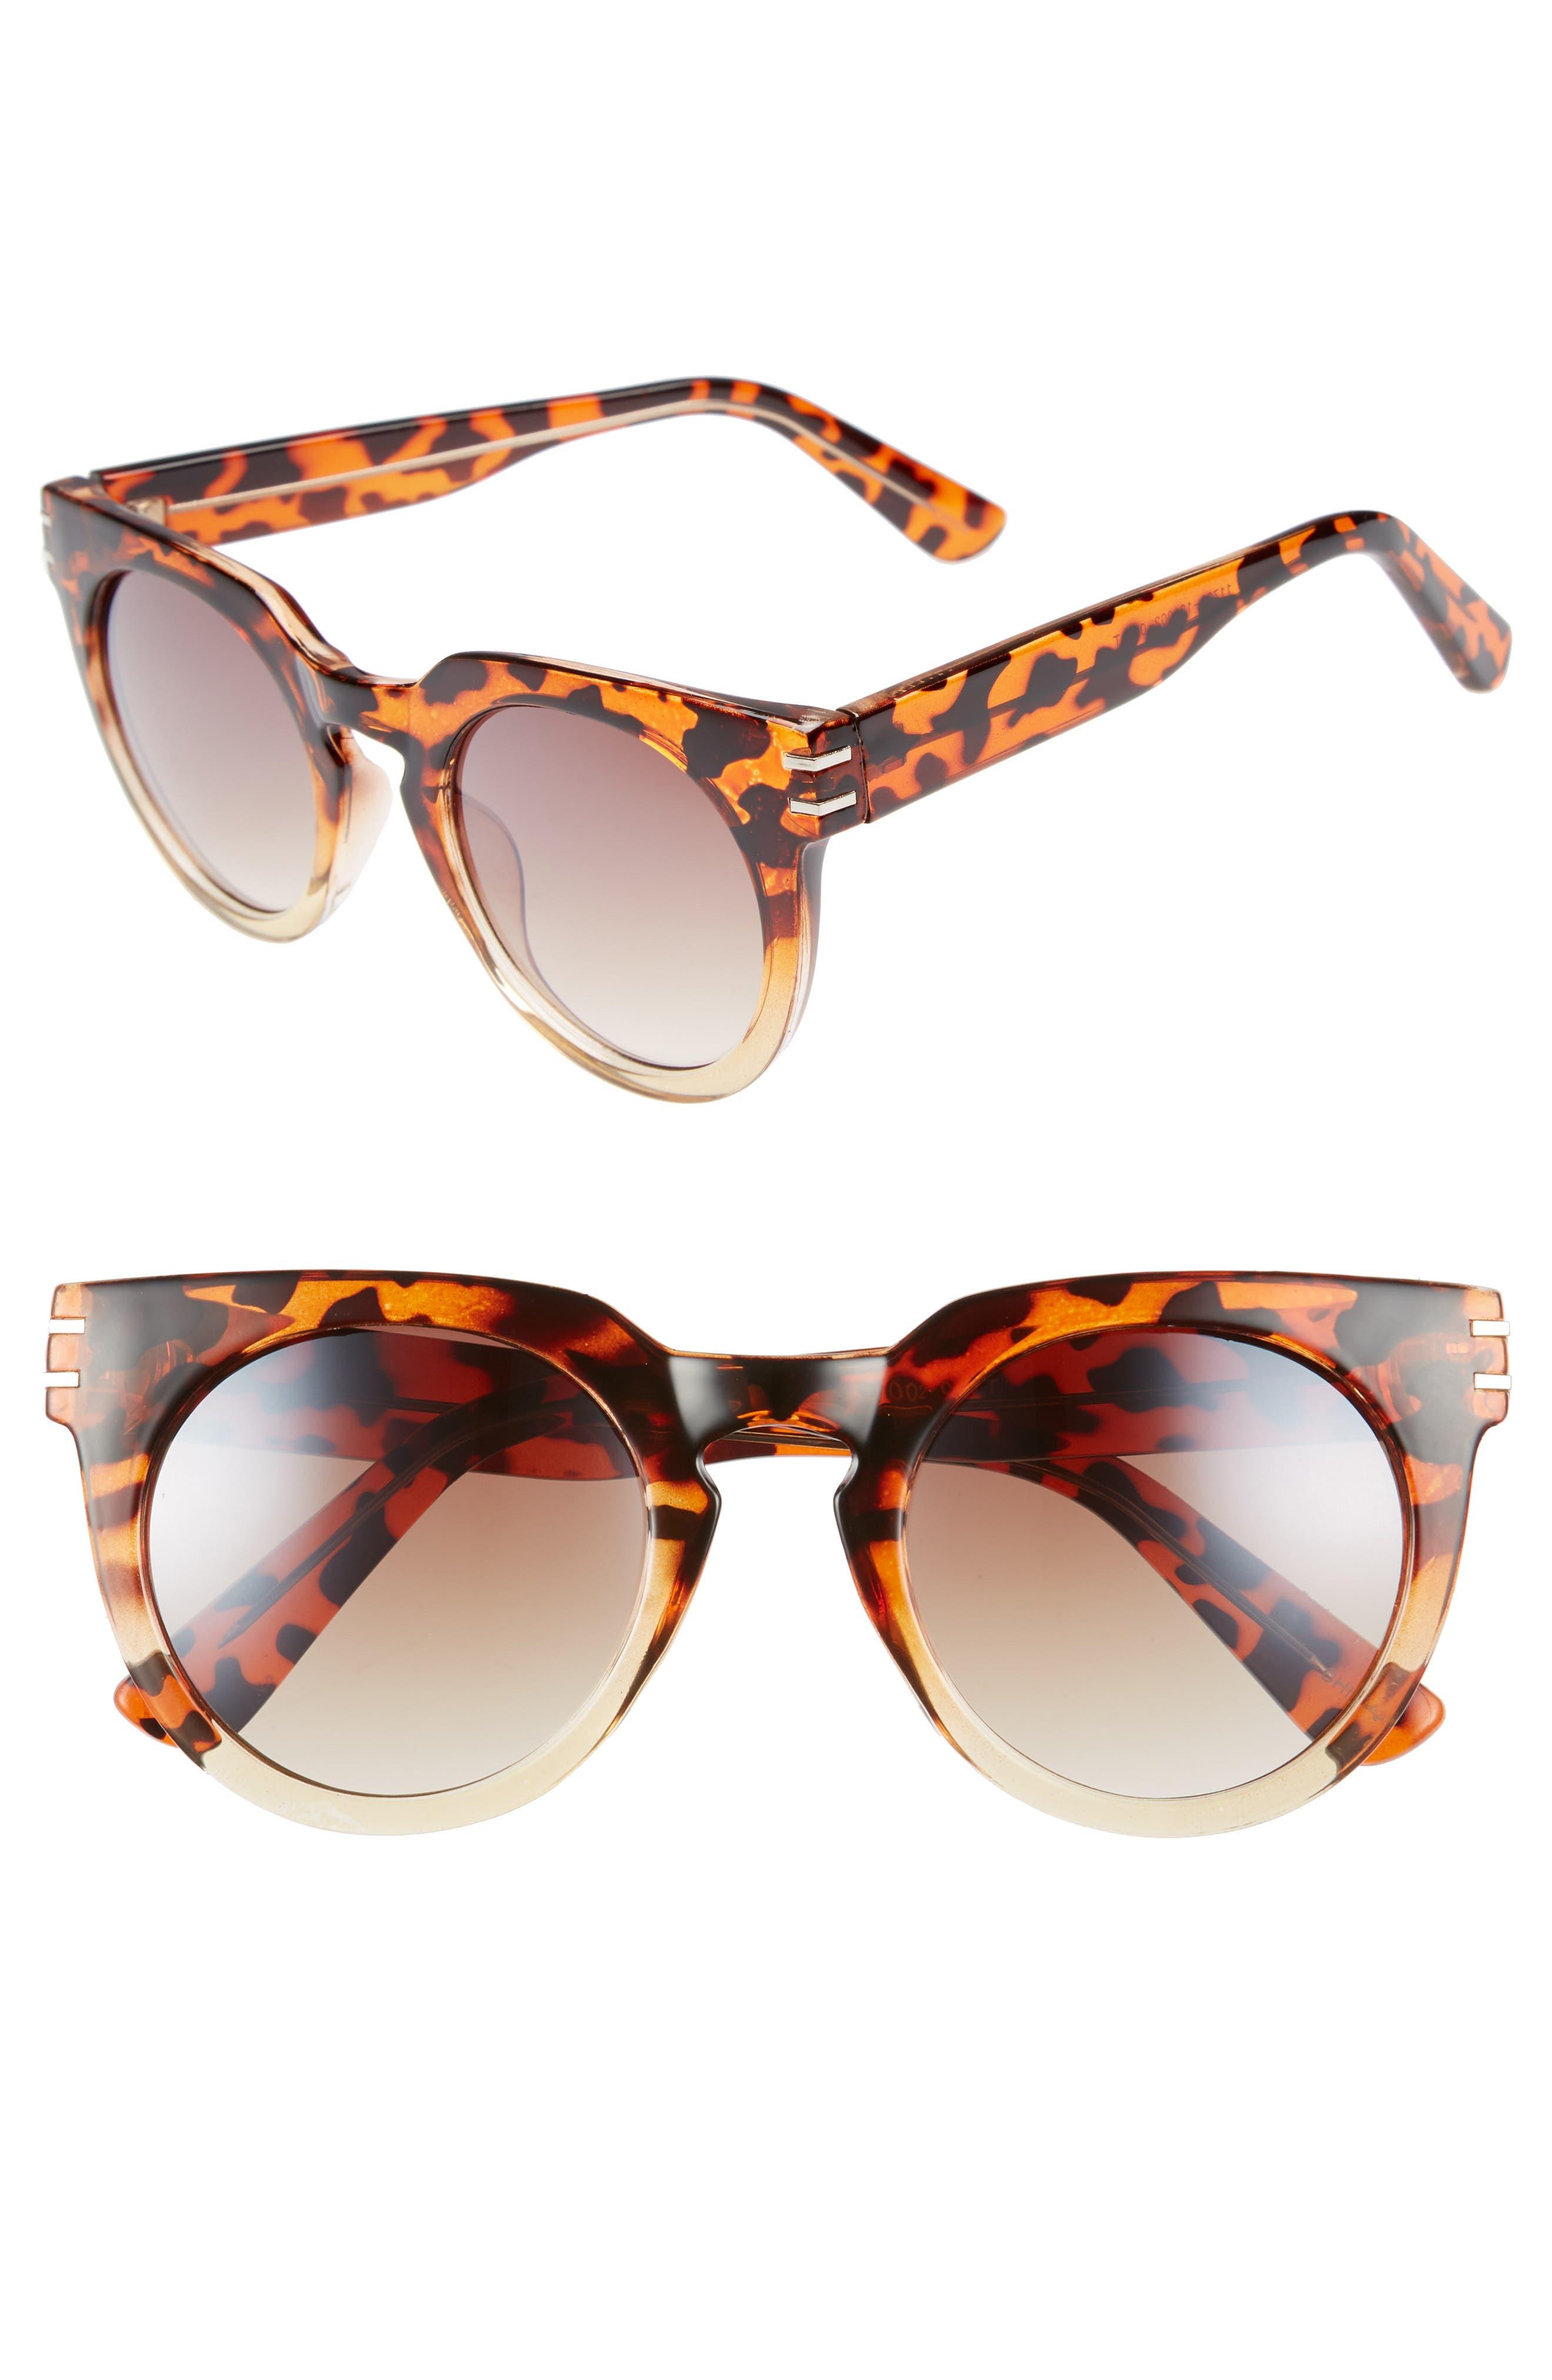 50mm Round Sunglasses,                         Main,                         color, 200